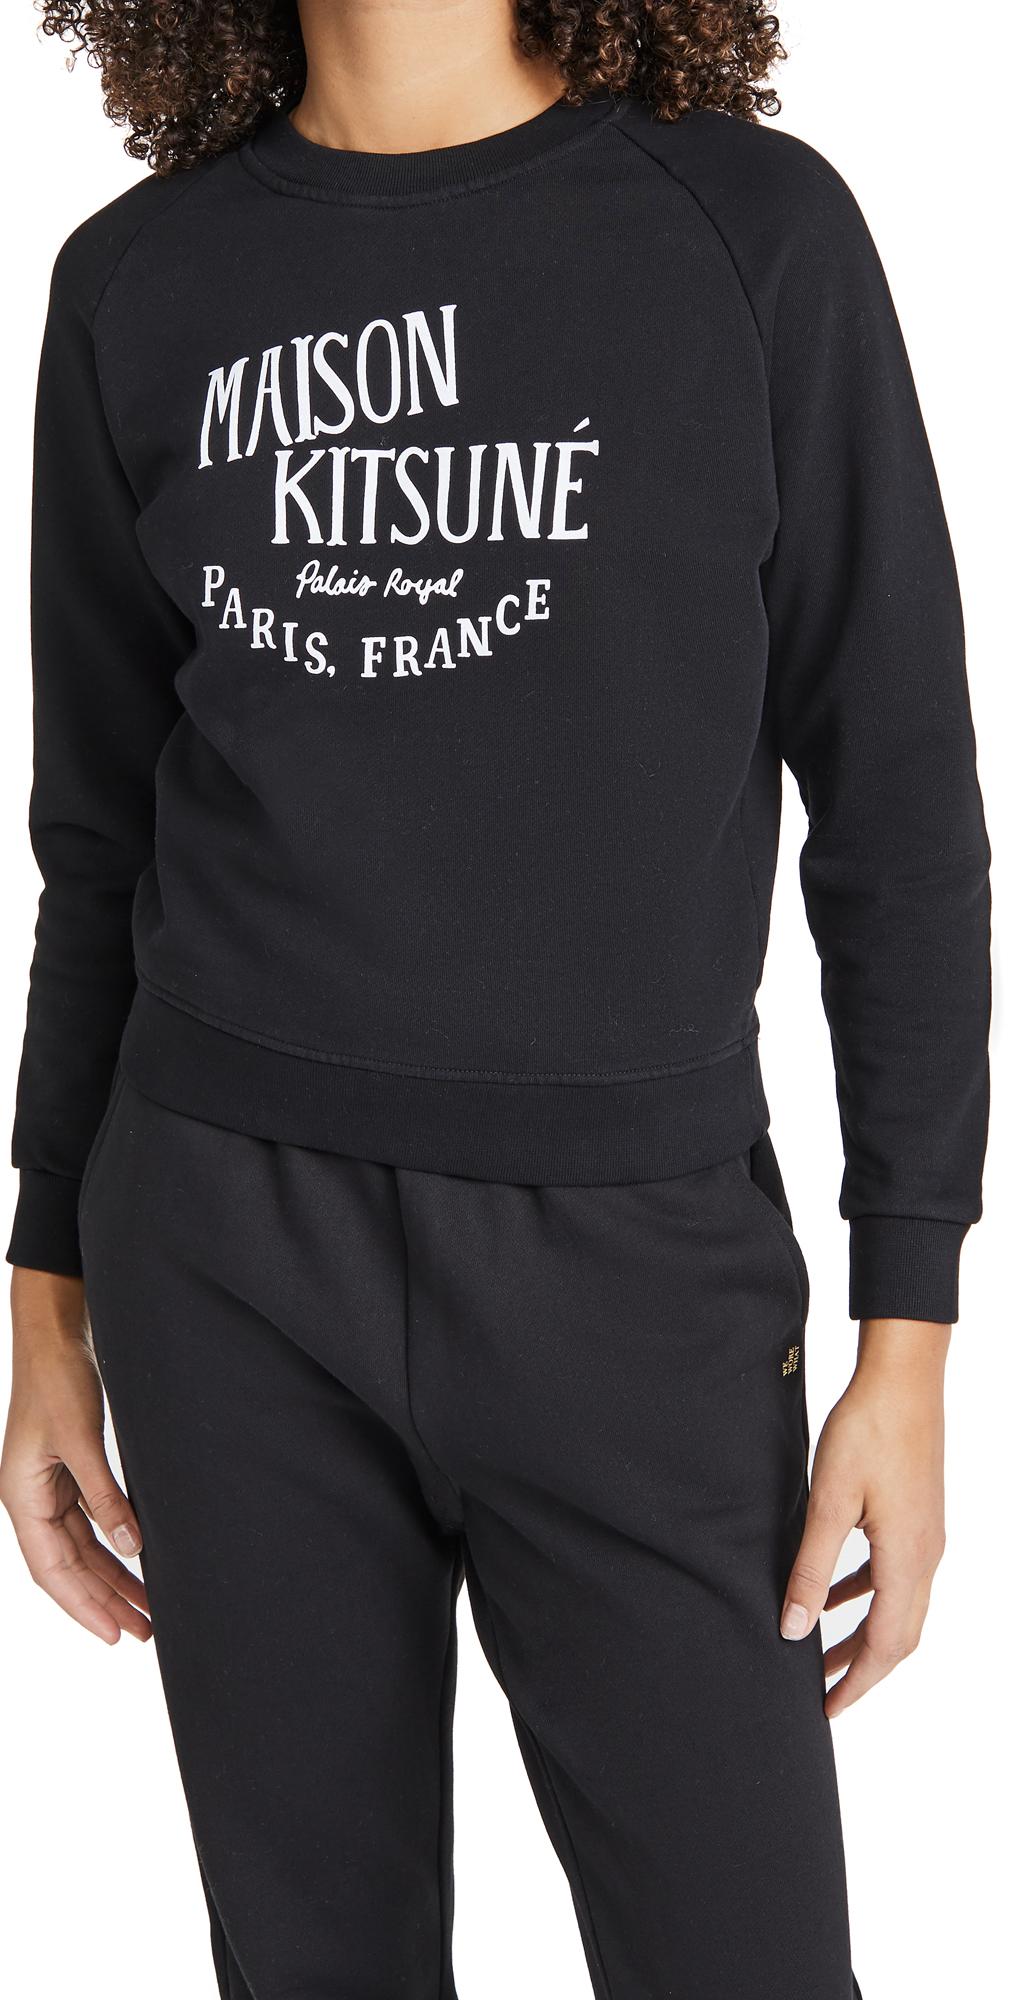 Maison Kitsune Palais Royal Vintage Sweatshirt